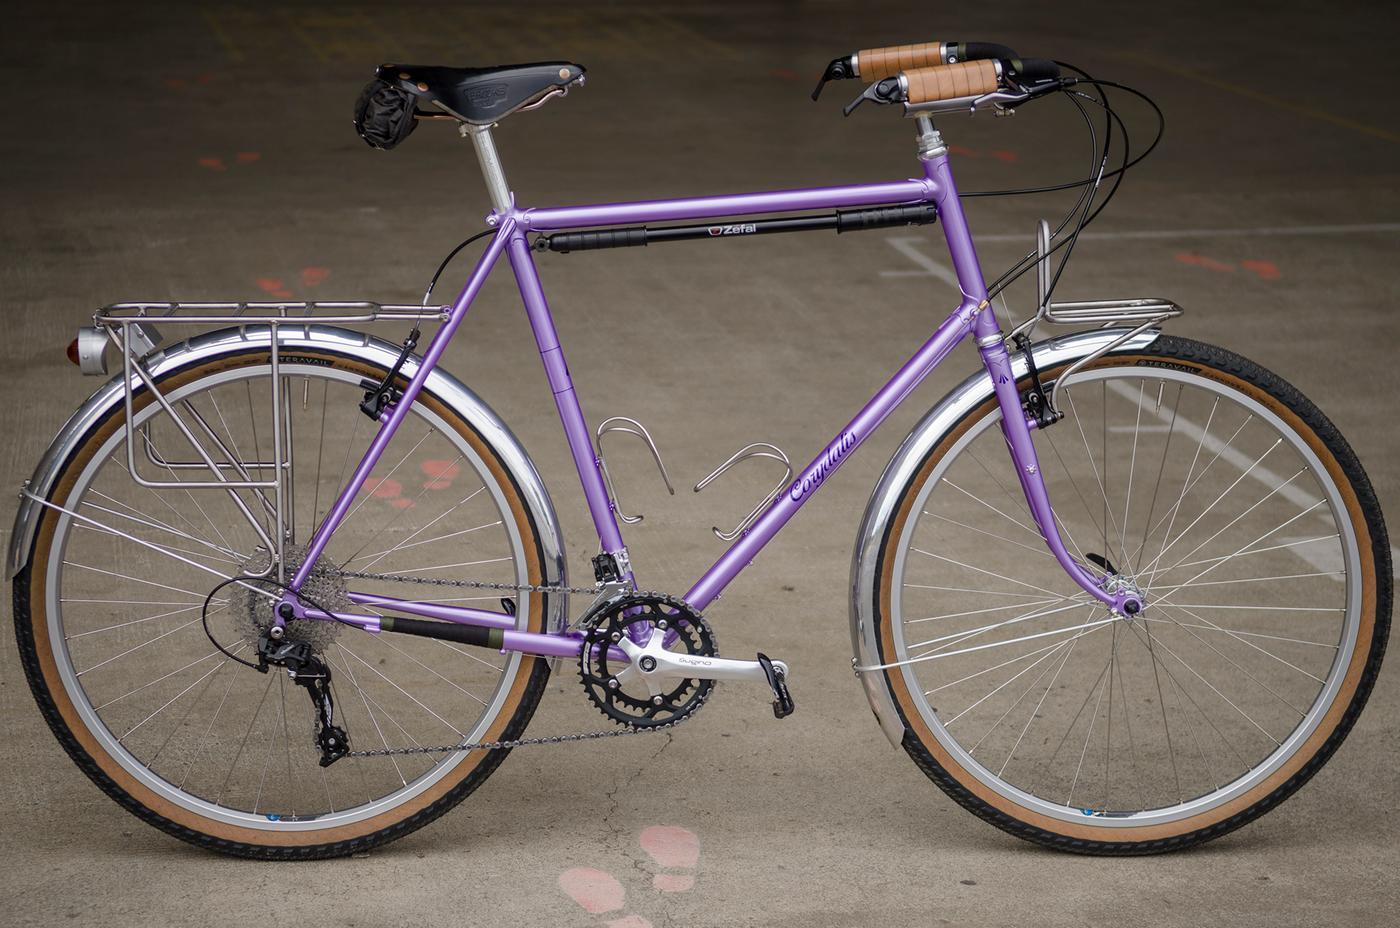 Readers' Rides: Shaun's Self-Built Columbus Cromor Lugged Tourer